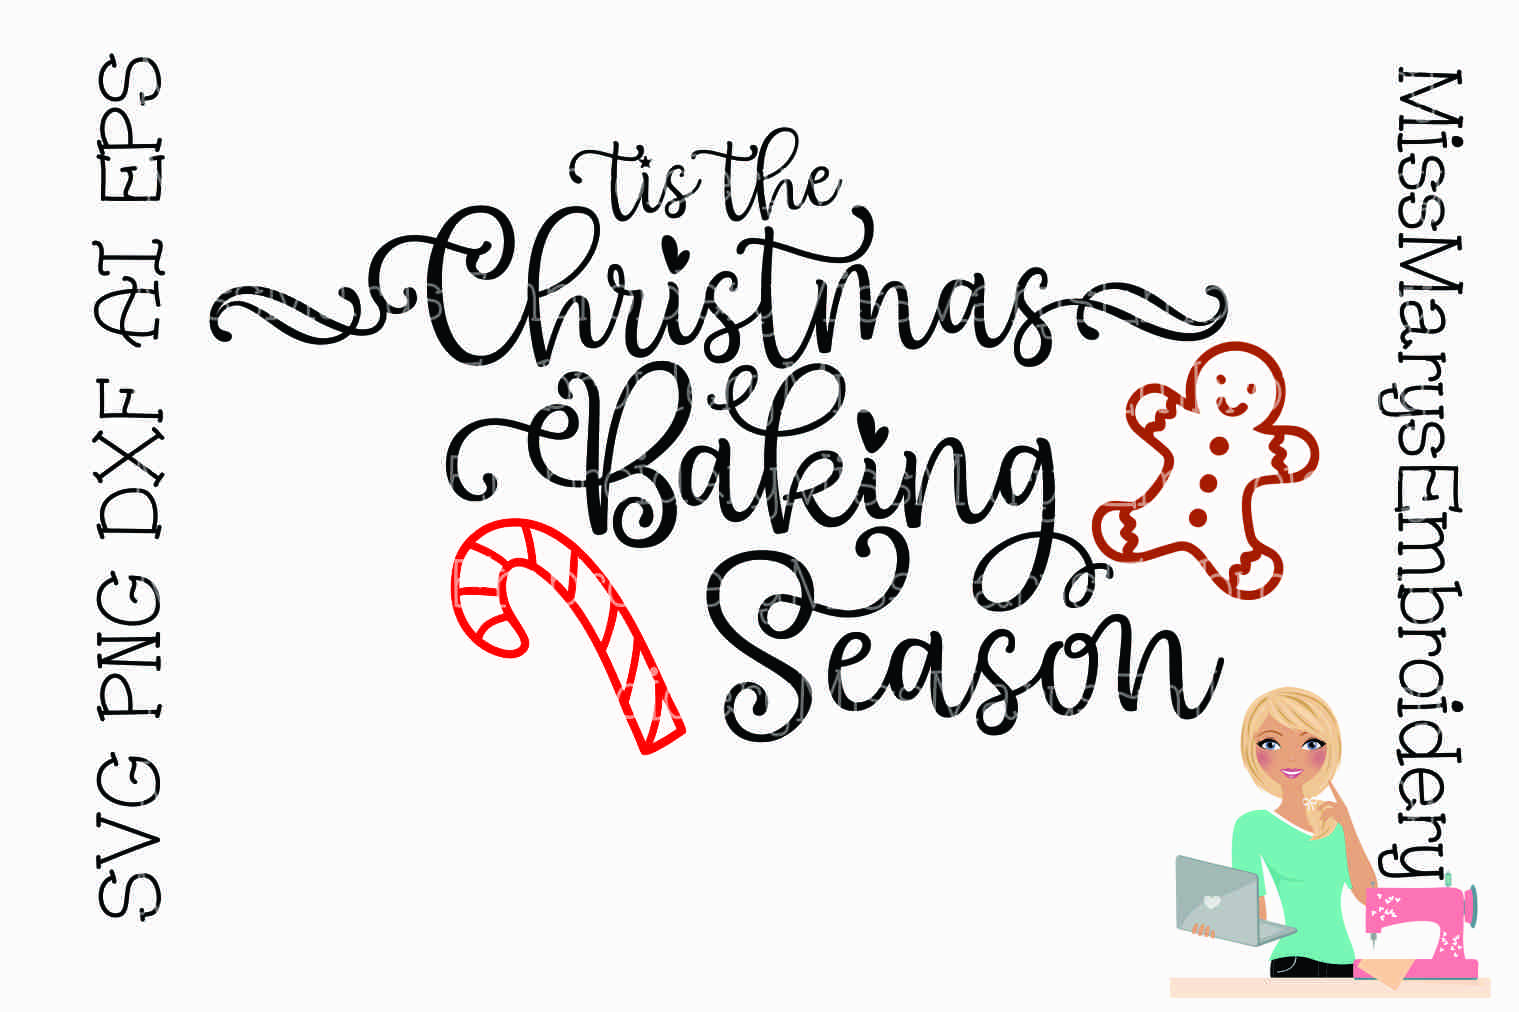 Christmas Baking Season Saying SVG Cutting File PNG DXF AI example image 1